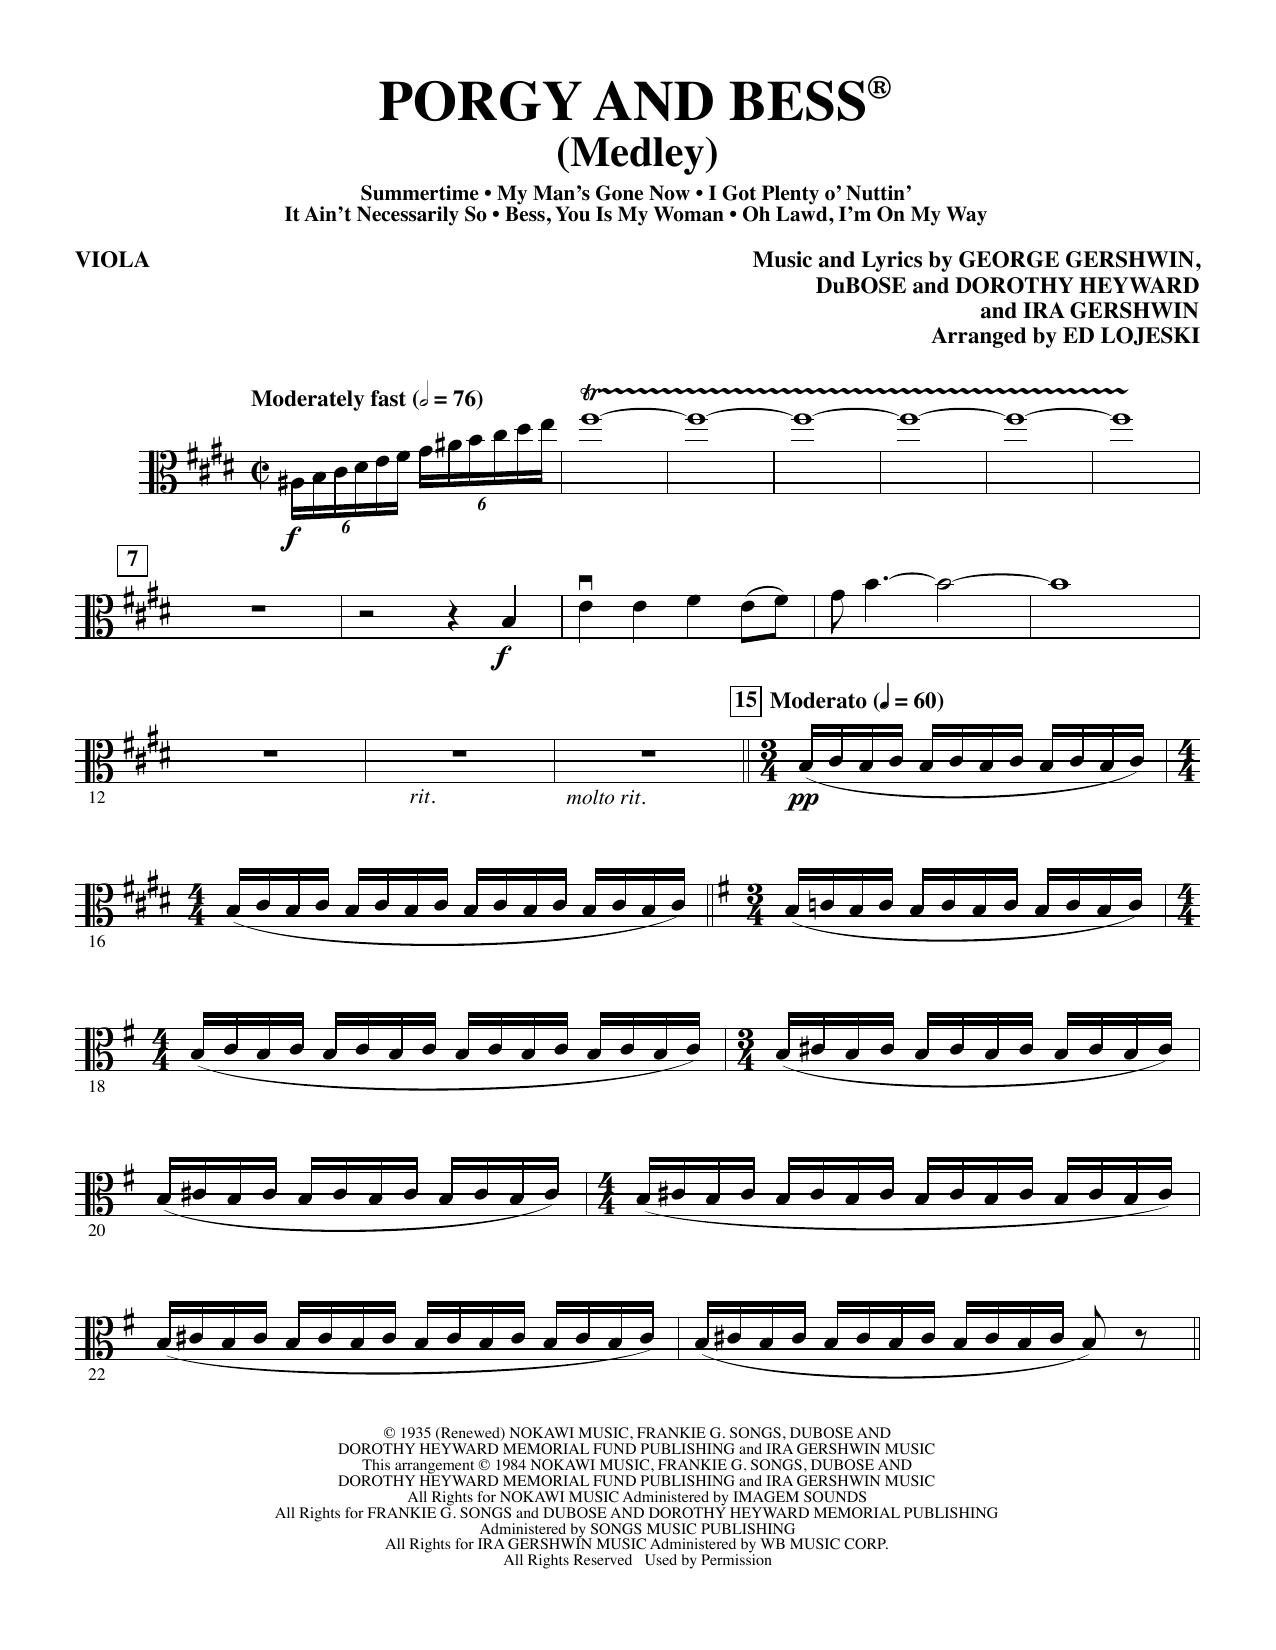 Porgy and Bess (Medley) - Viola Sheet Music